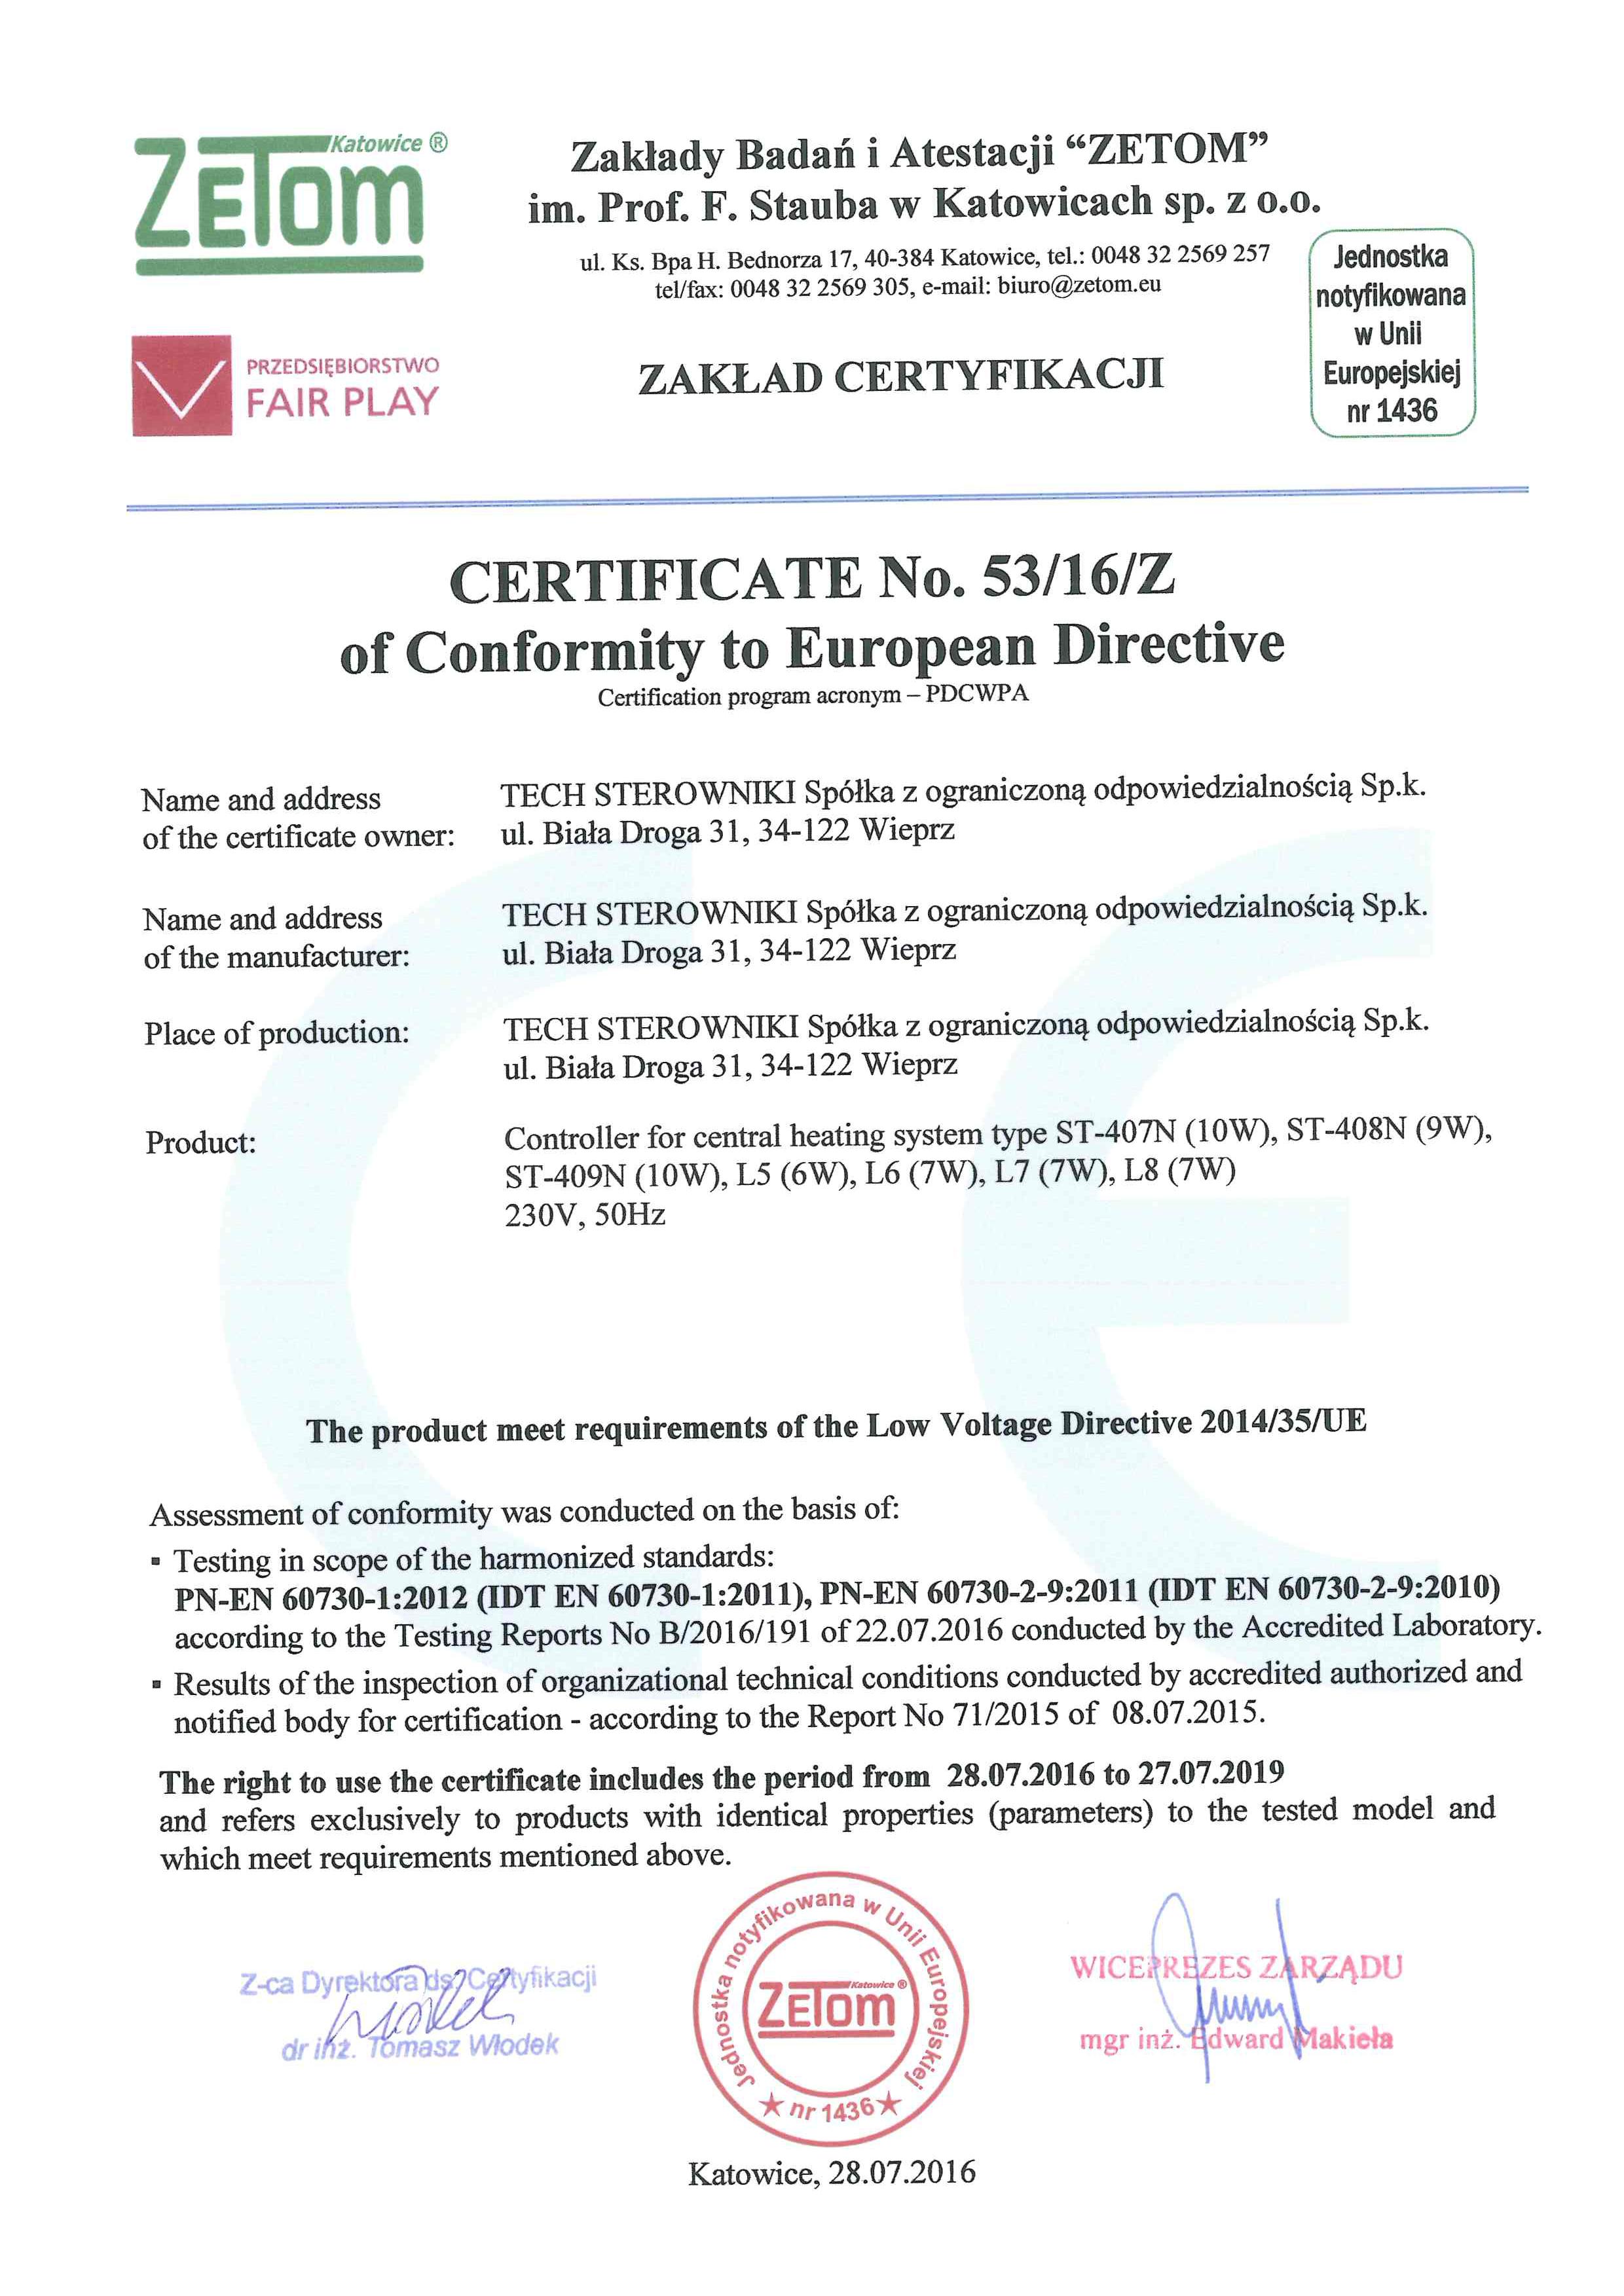 Certyficate of conformity to Europen Directive